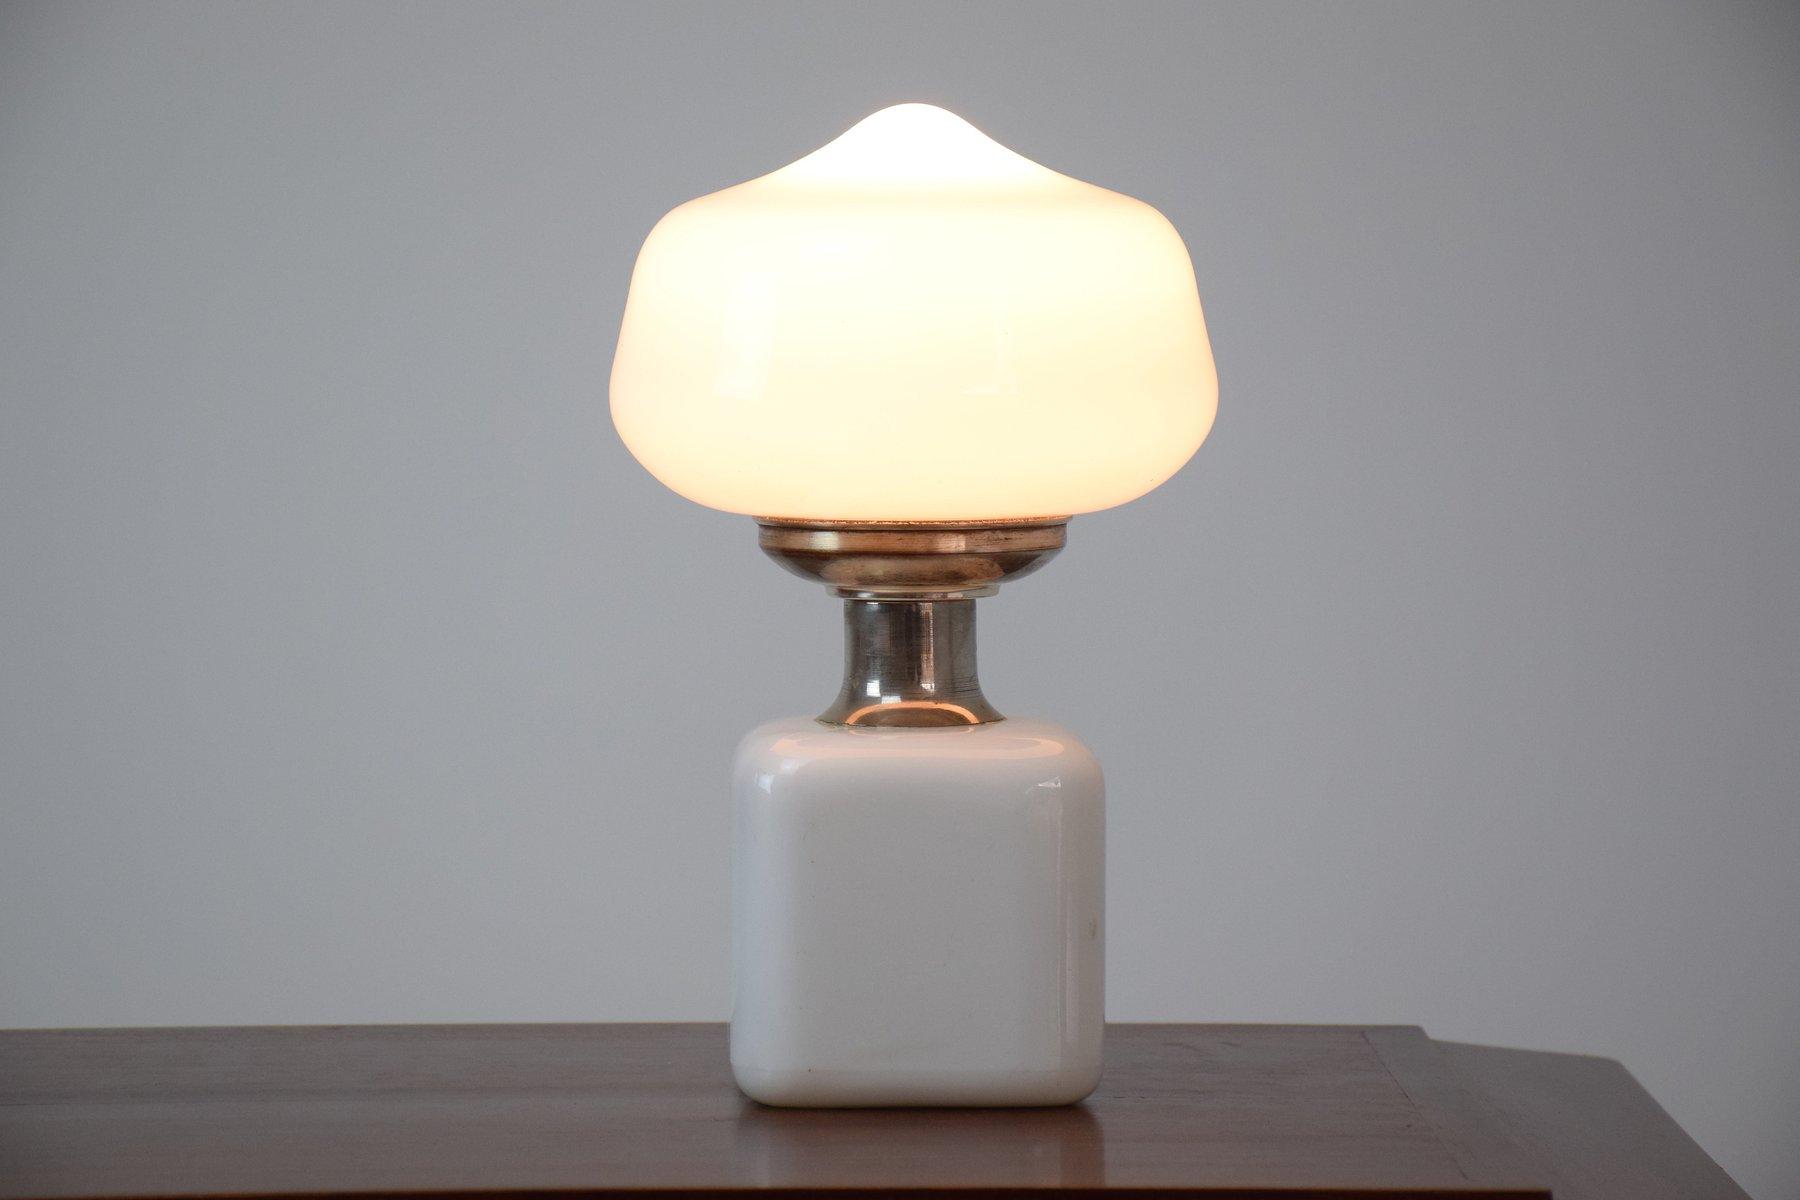 Mid century white glass mushroom table lamp 1970s for for Z gallerie century table lamp